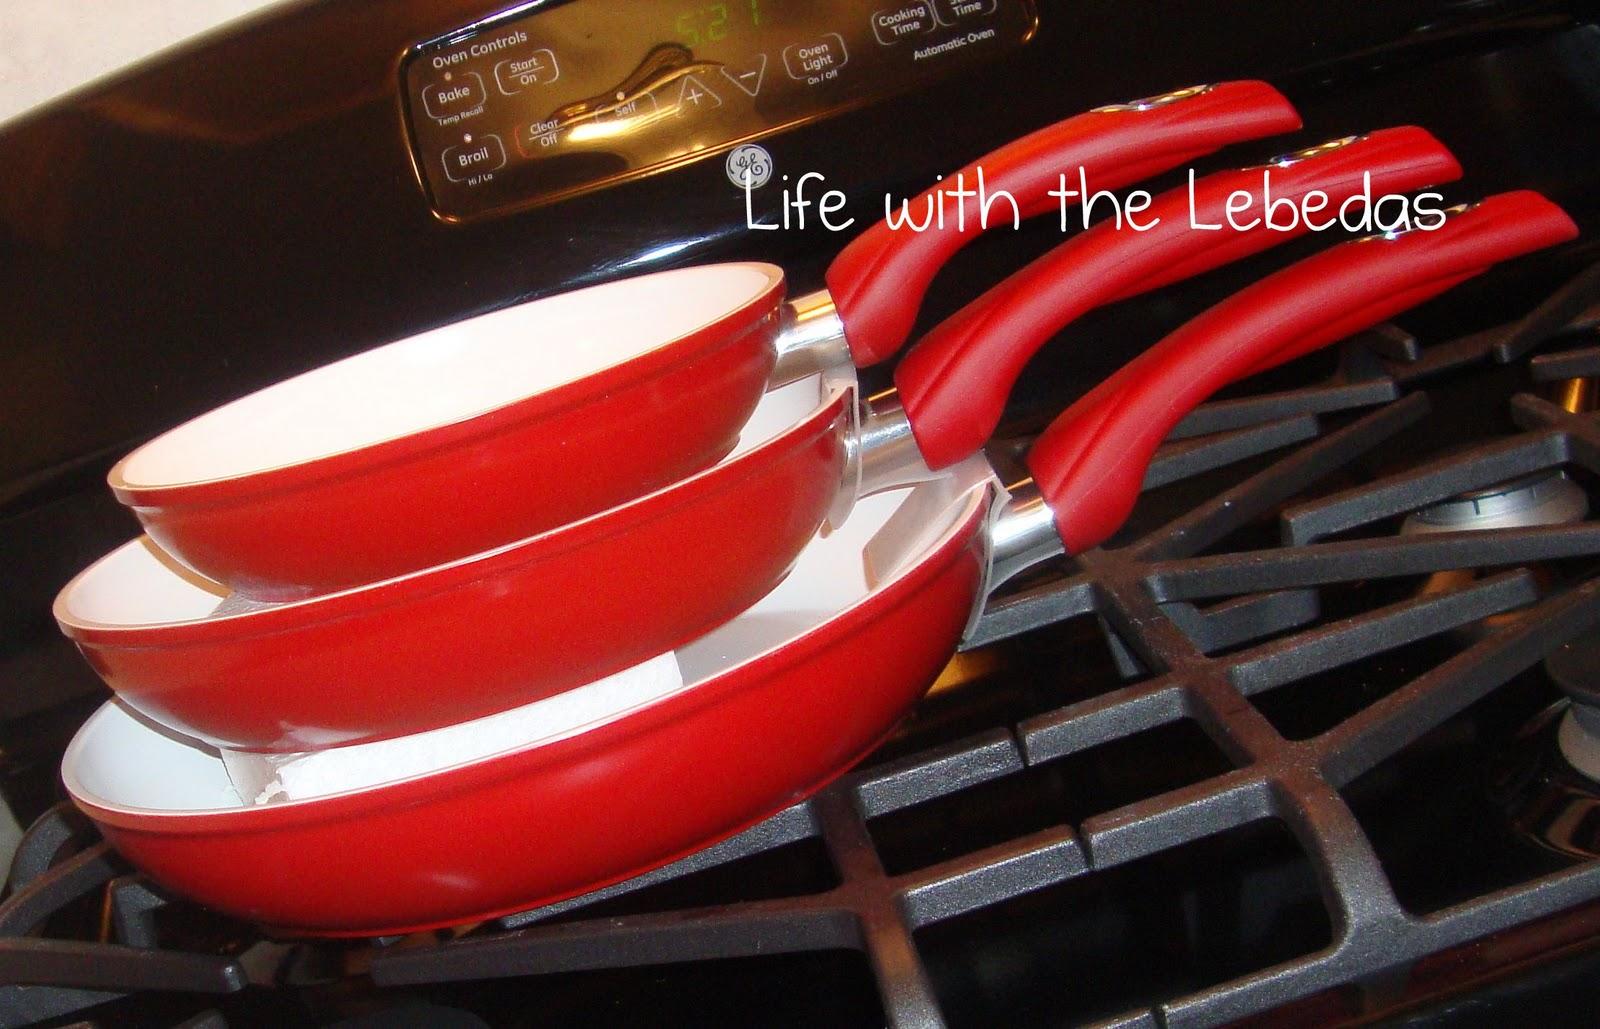 Designer Cookware